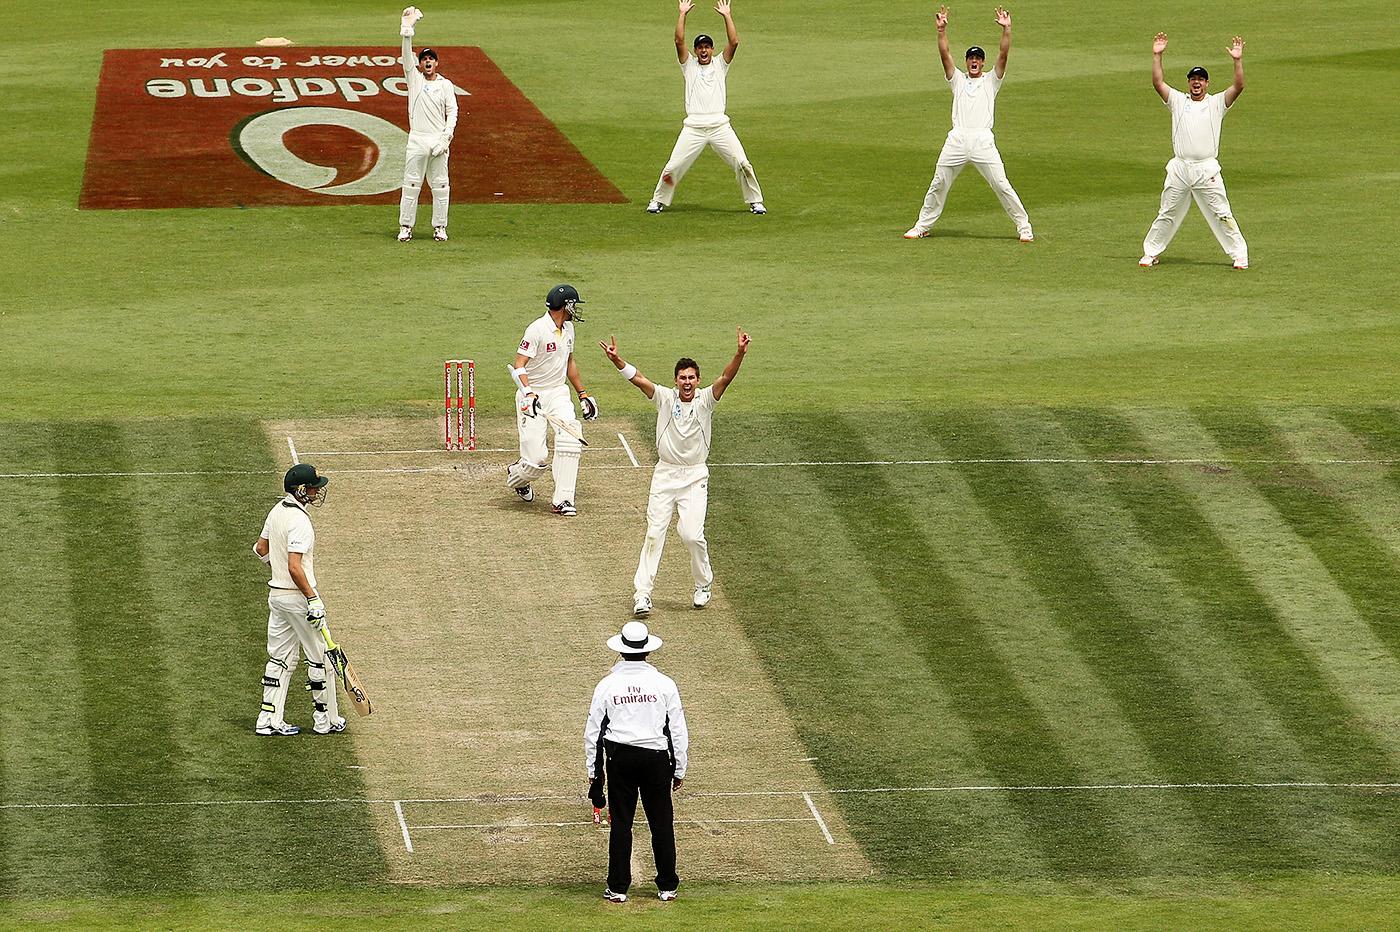 Hobart huzzah: Boult made his Test debut in an unforgettable seven-run win in Australia, 2011-12